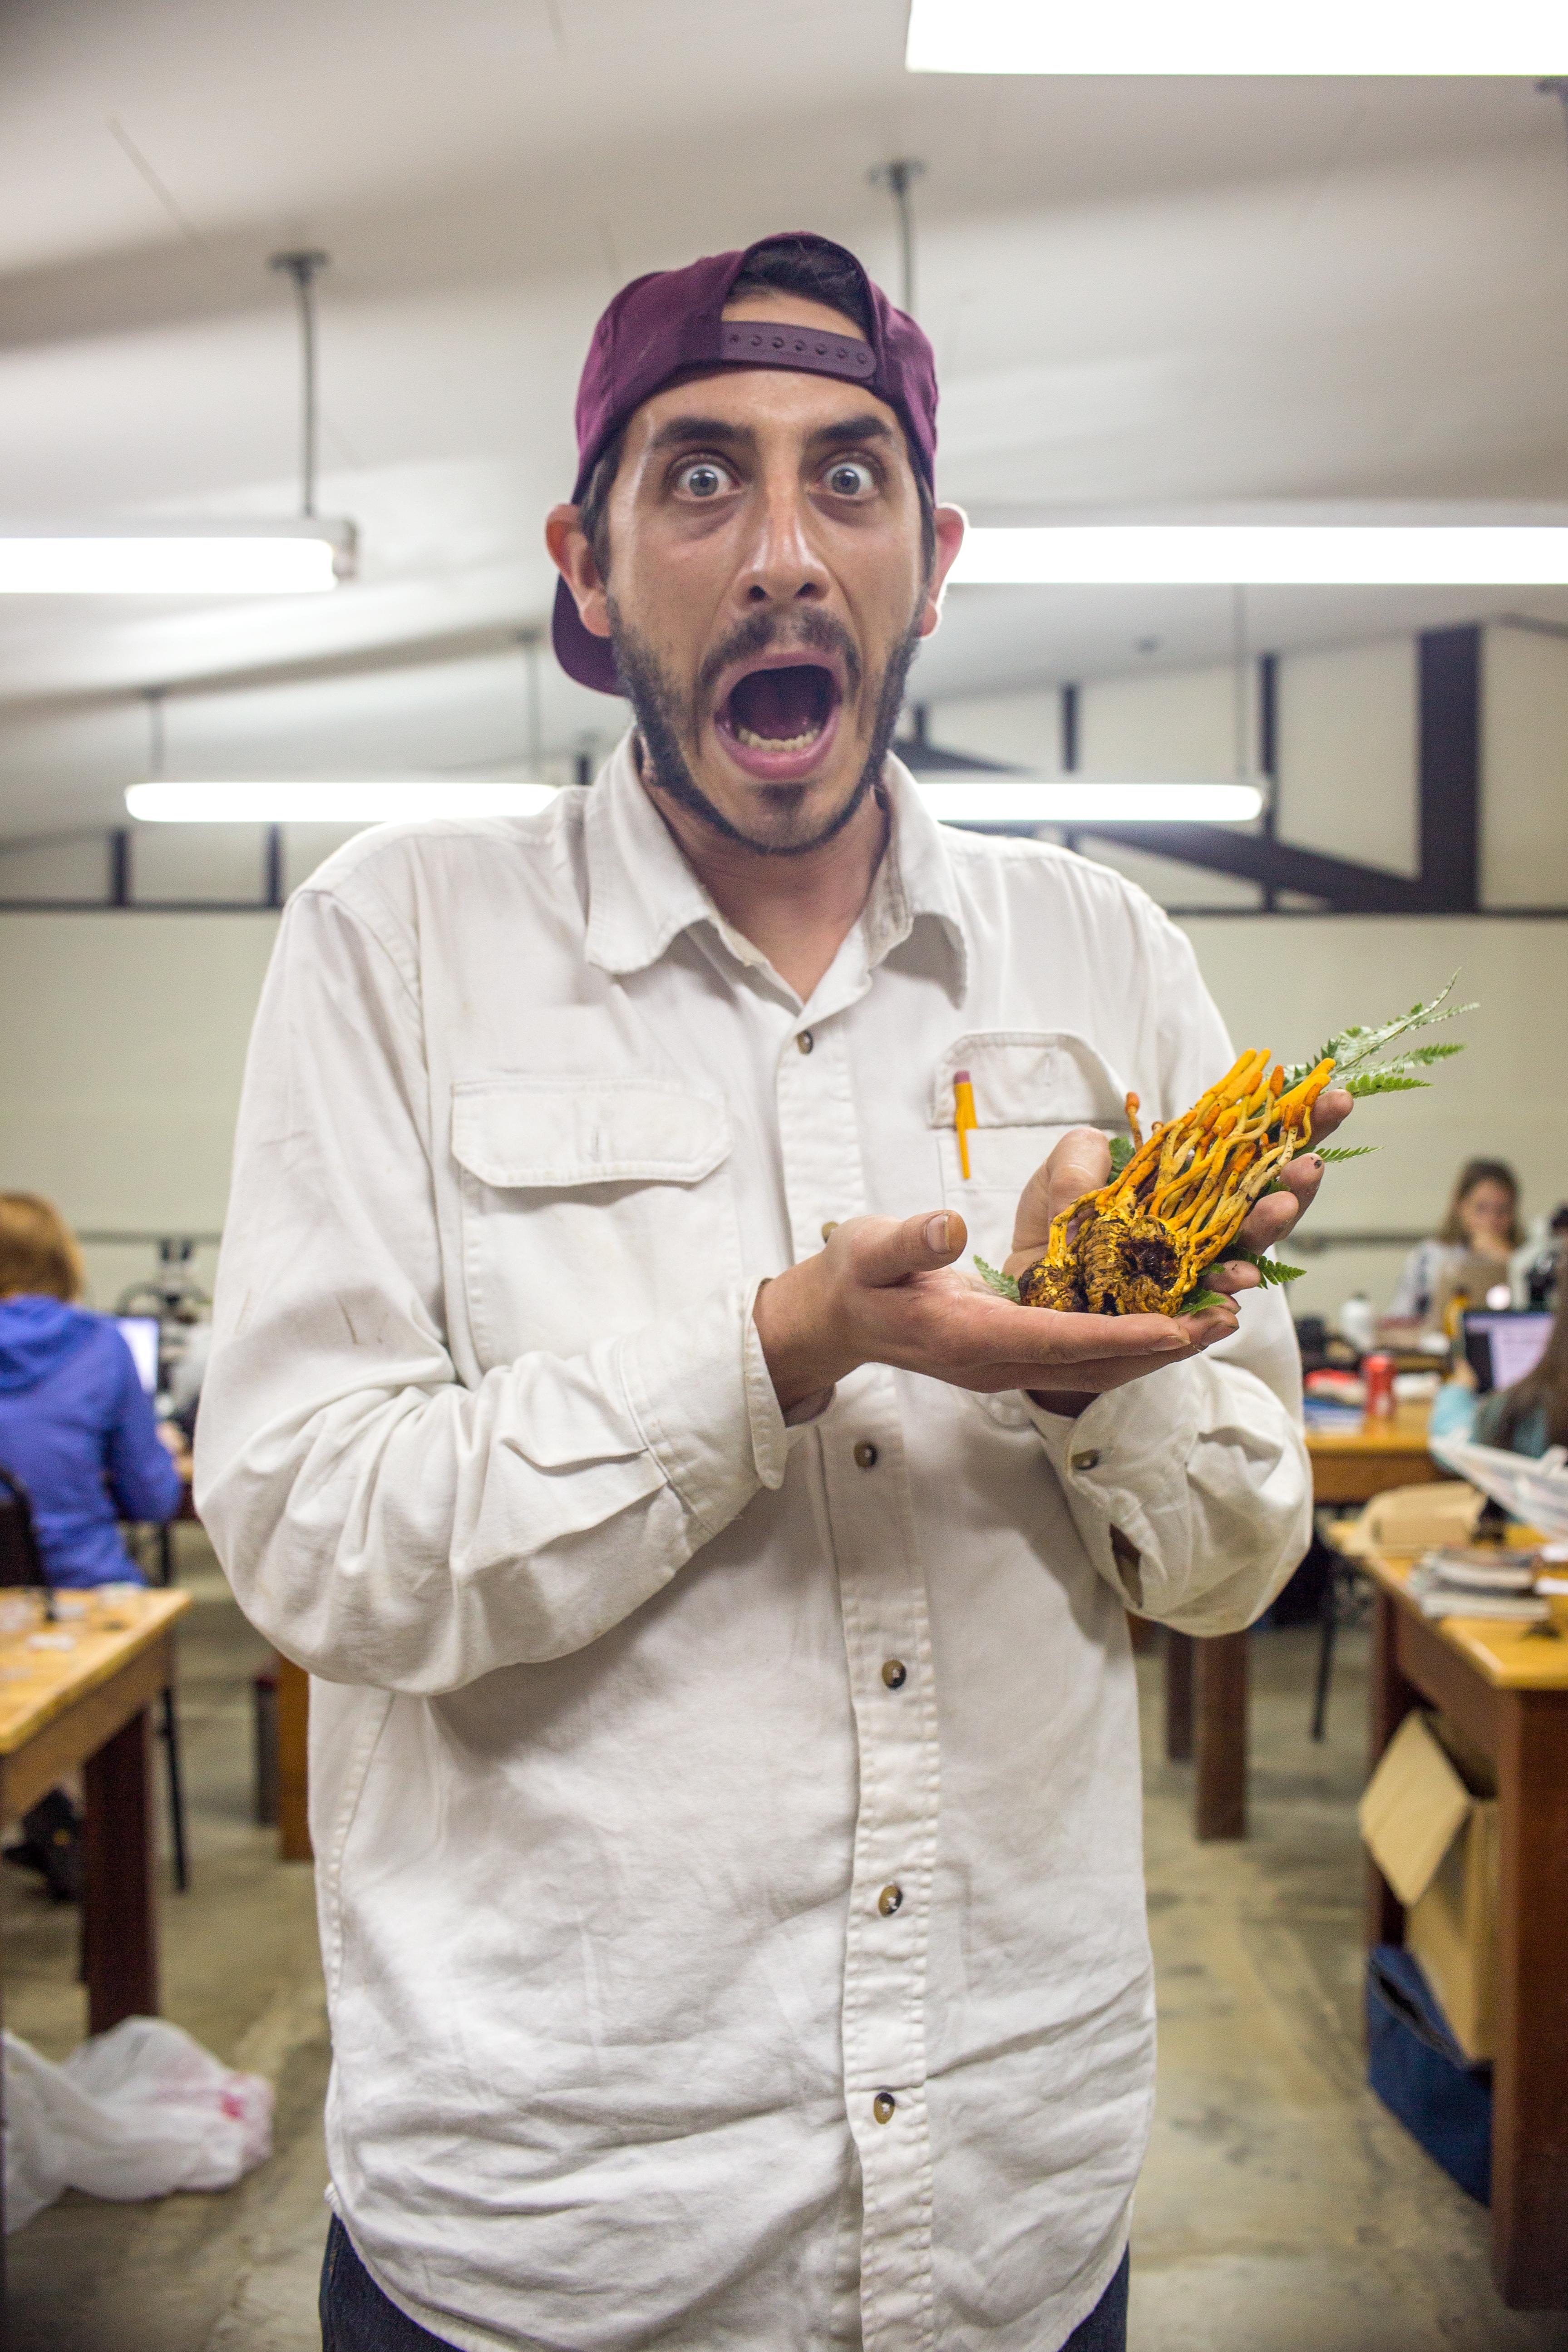 Cordyceps melolonthae image